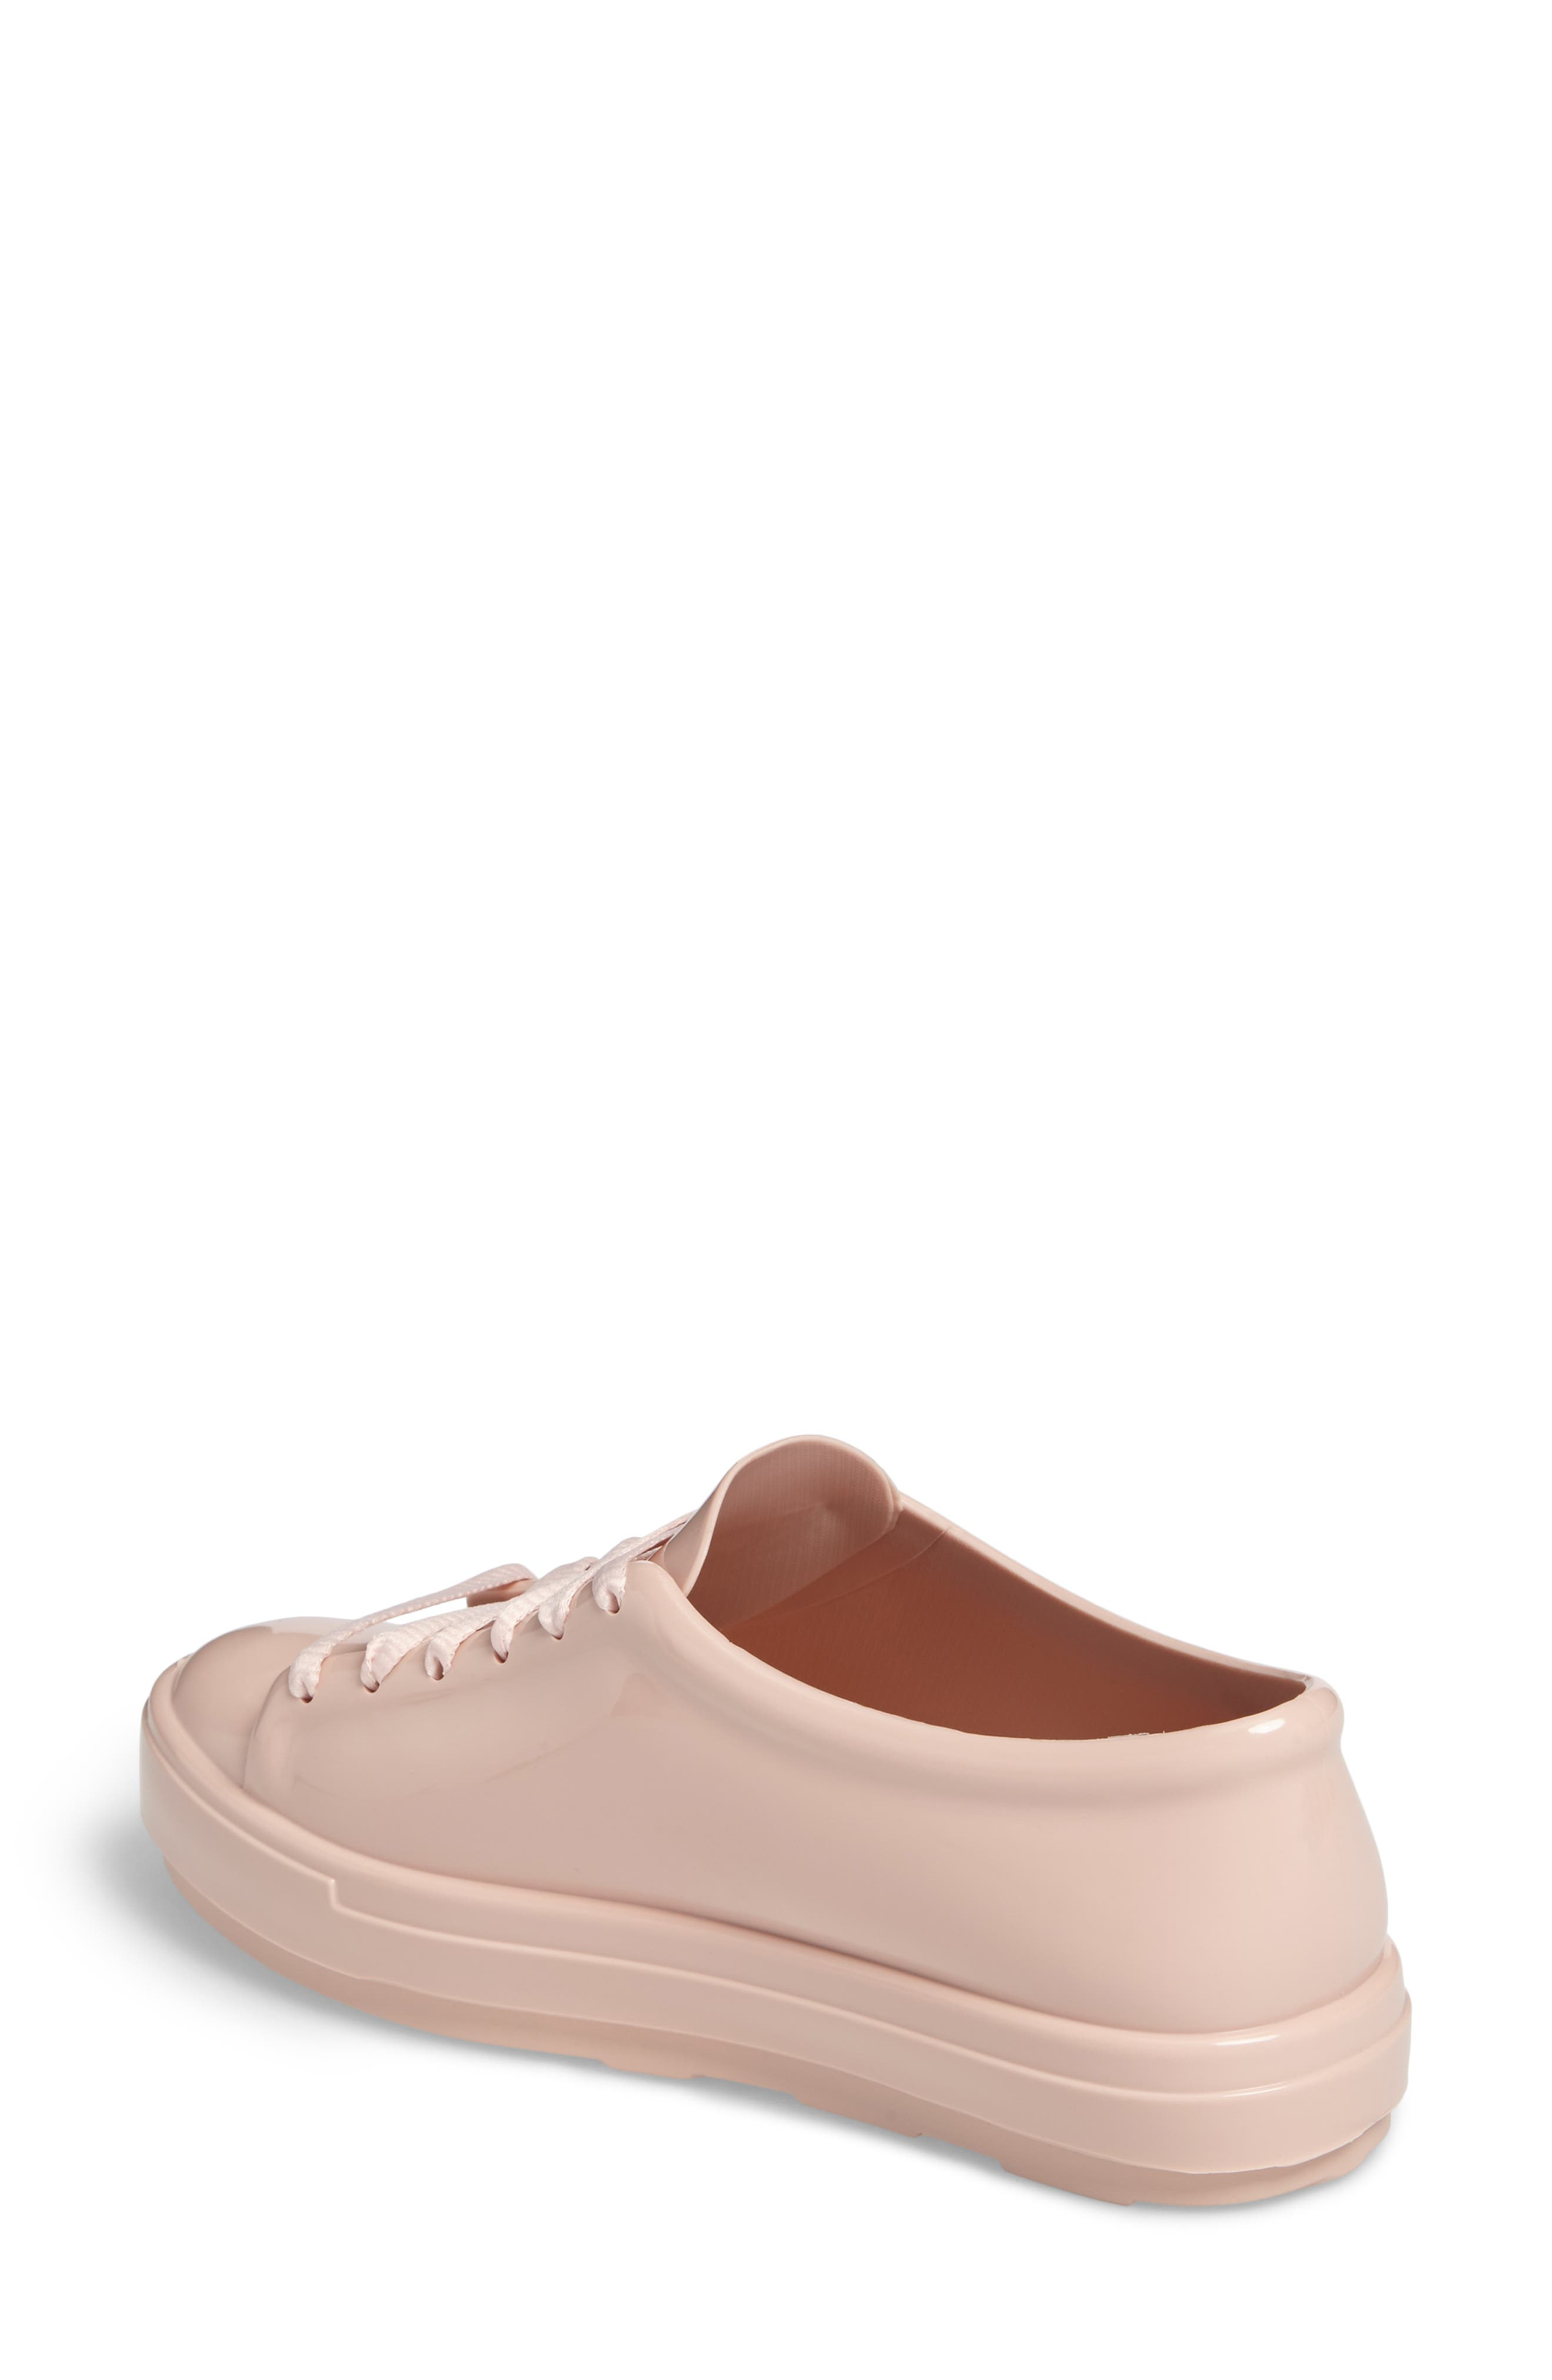 Be Sneaker,                             Alternate thumbnail 2, color,                             Pink